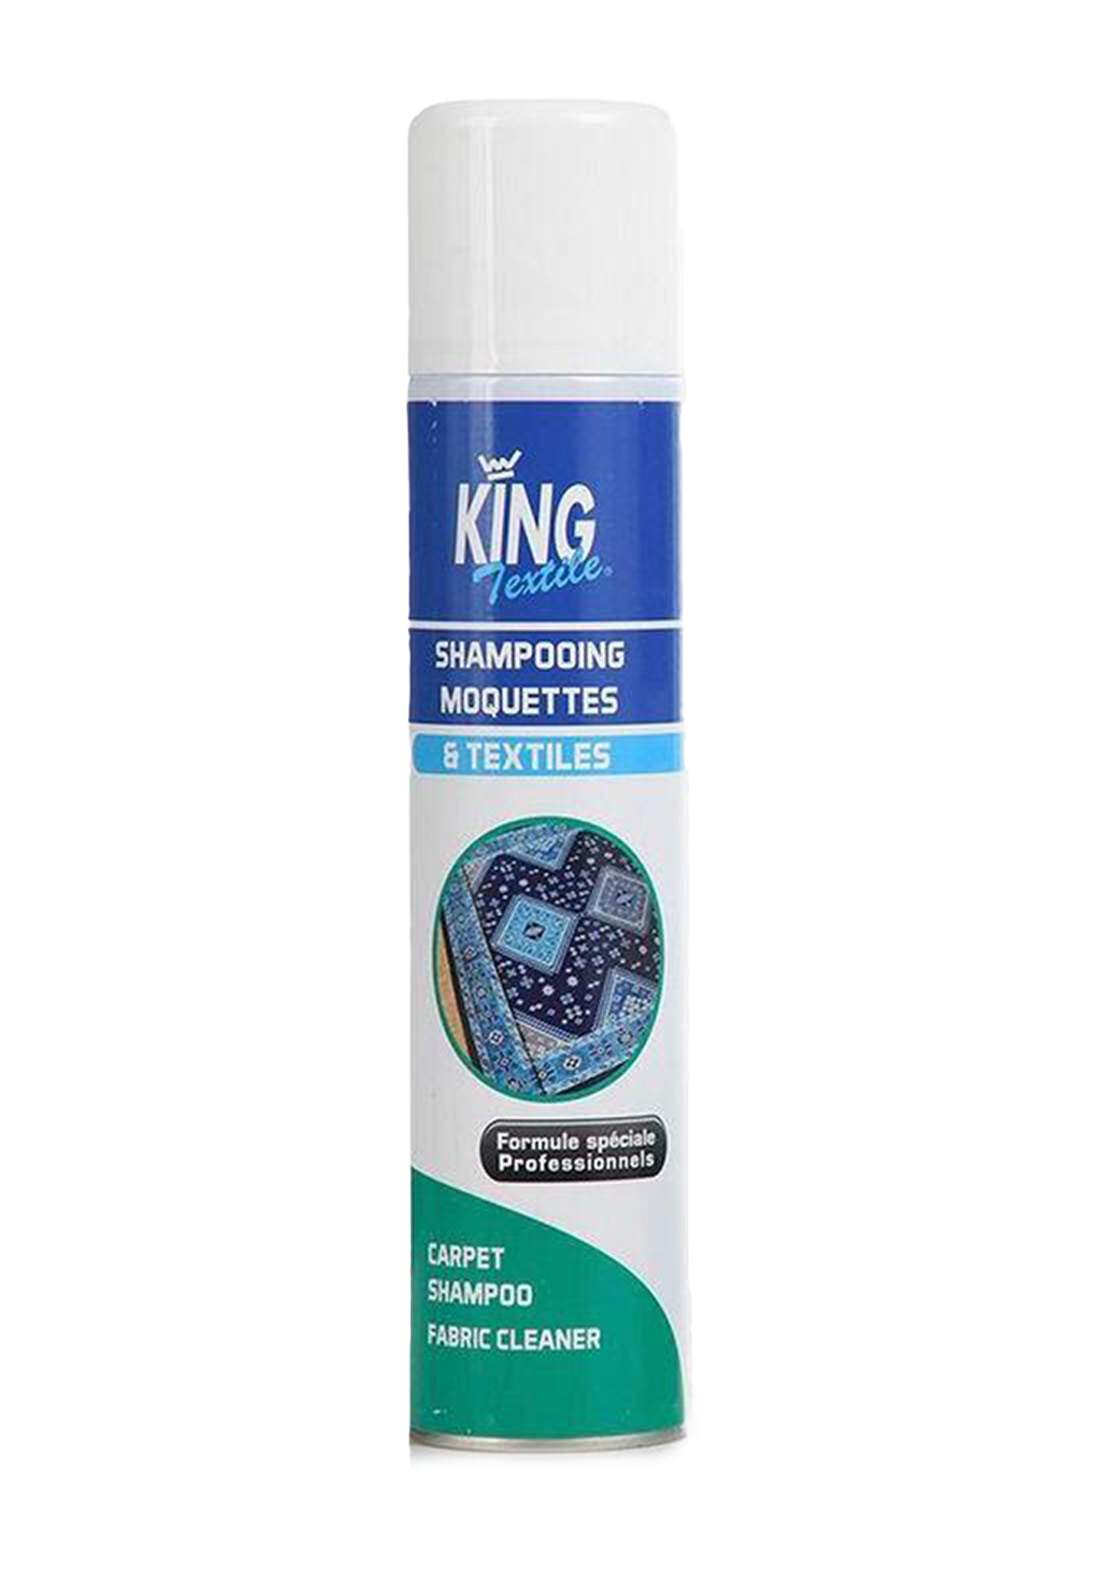 S.I.C.O King Carpet Shampoo 400ml شامبو تنظيف السجاد و الموكيت